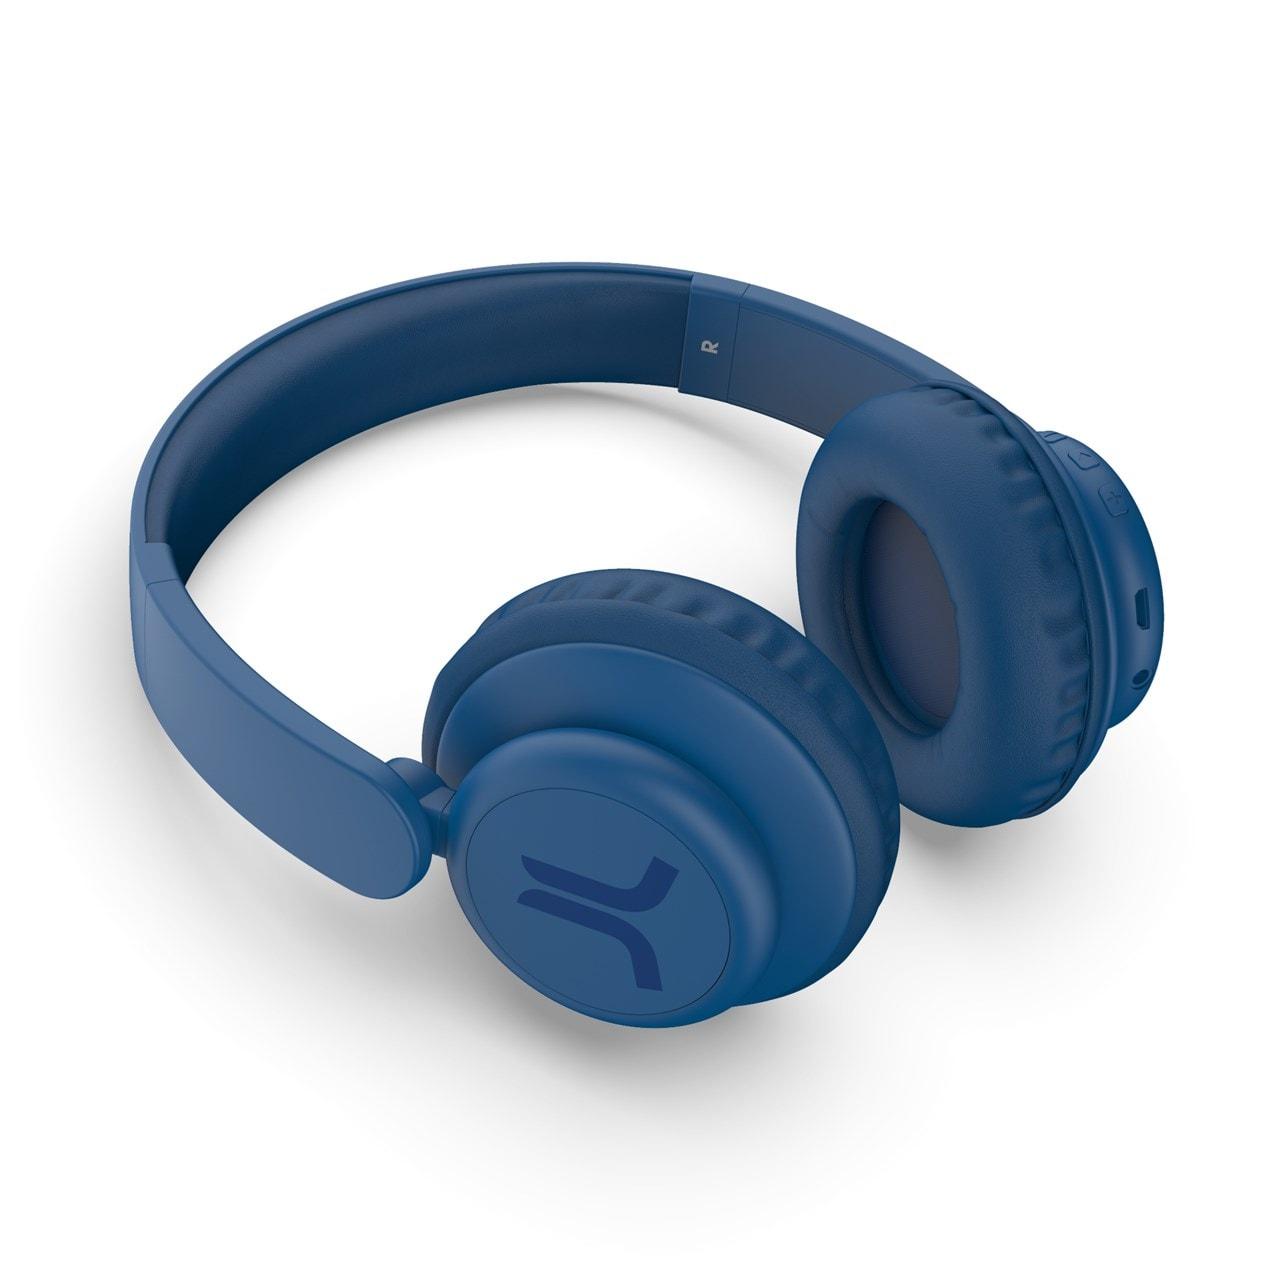 WeSC Navy Blue Bluetooth Headphones - 2